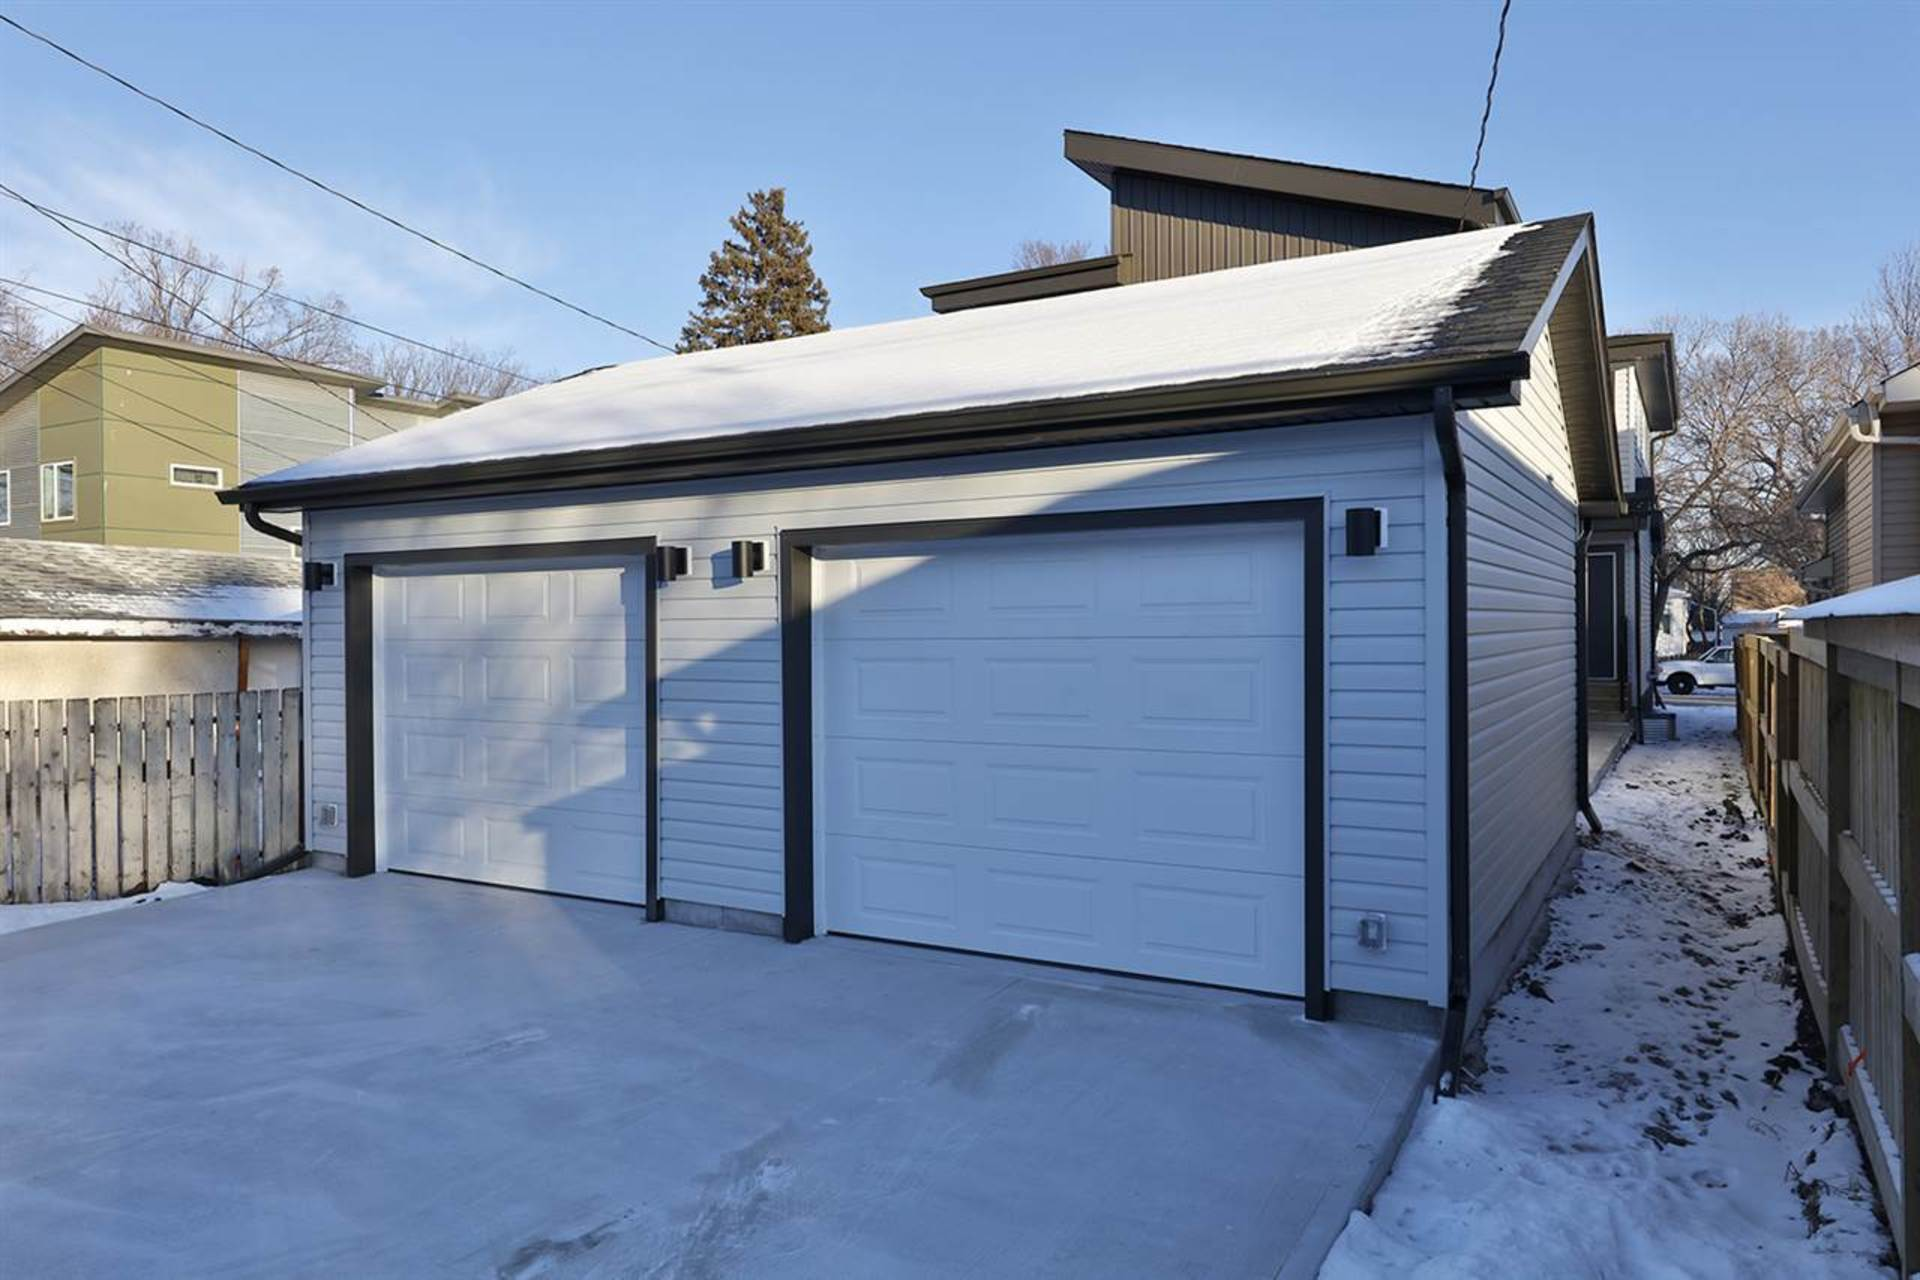 11636-84-street-parkdale_edmo-edmonton-19 at 11636 84 Street, Parkdale_EDMO, Edmonton